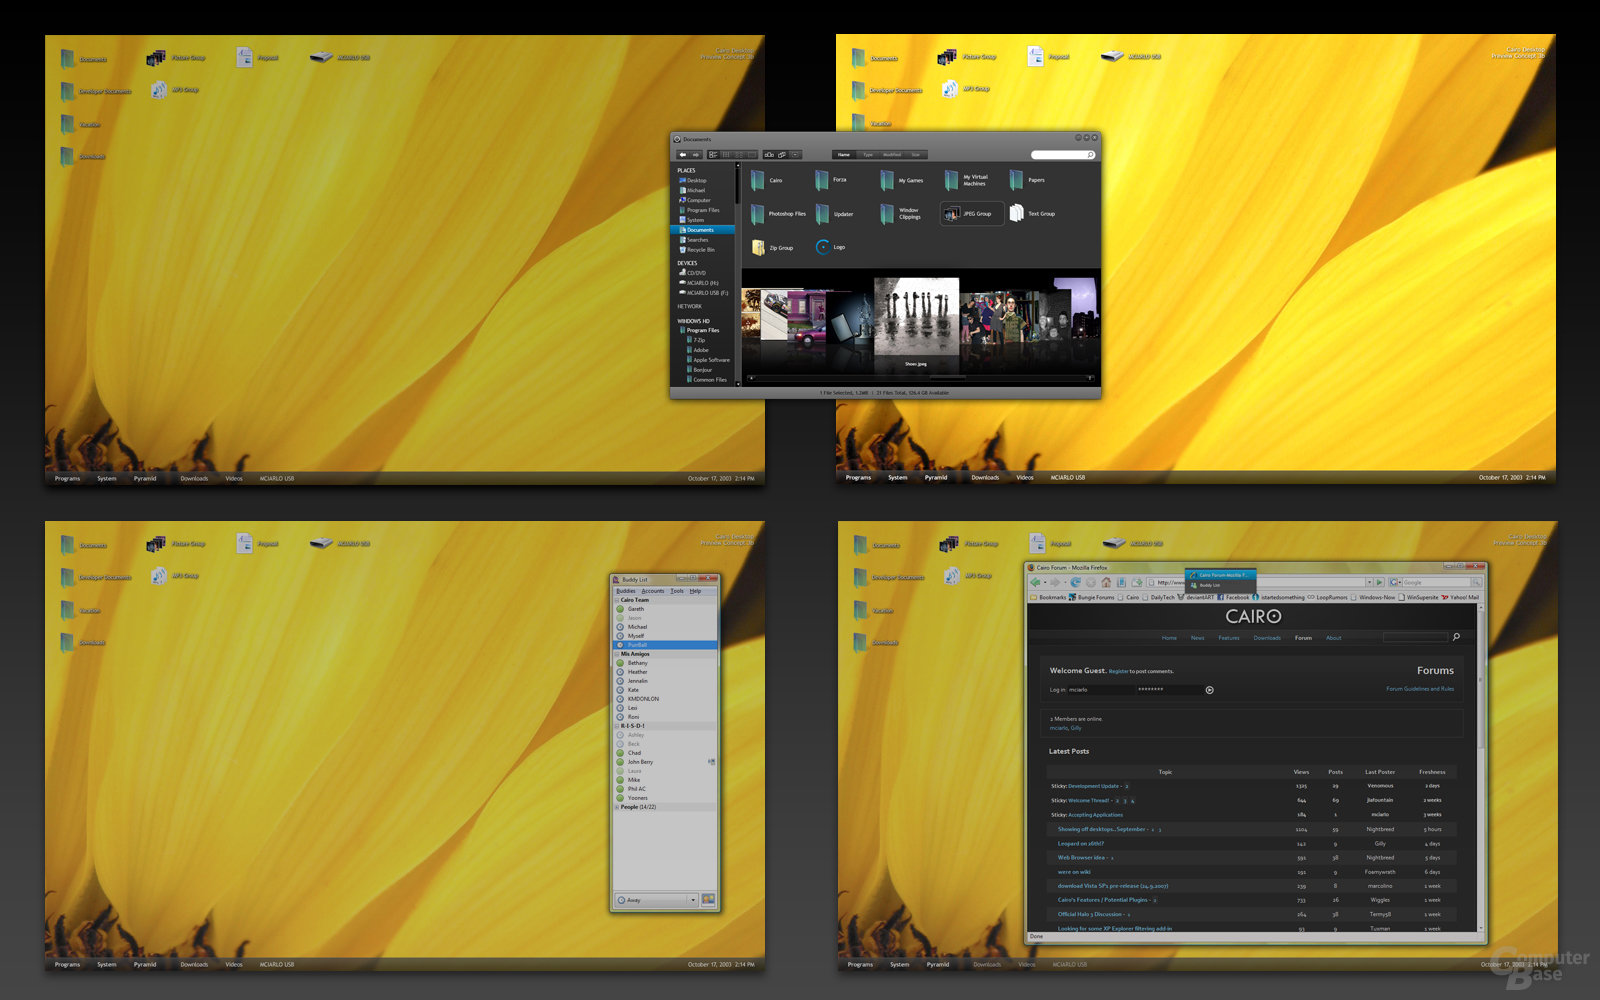 Cairo Desktop-Switching